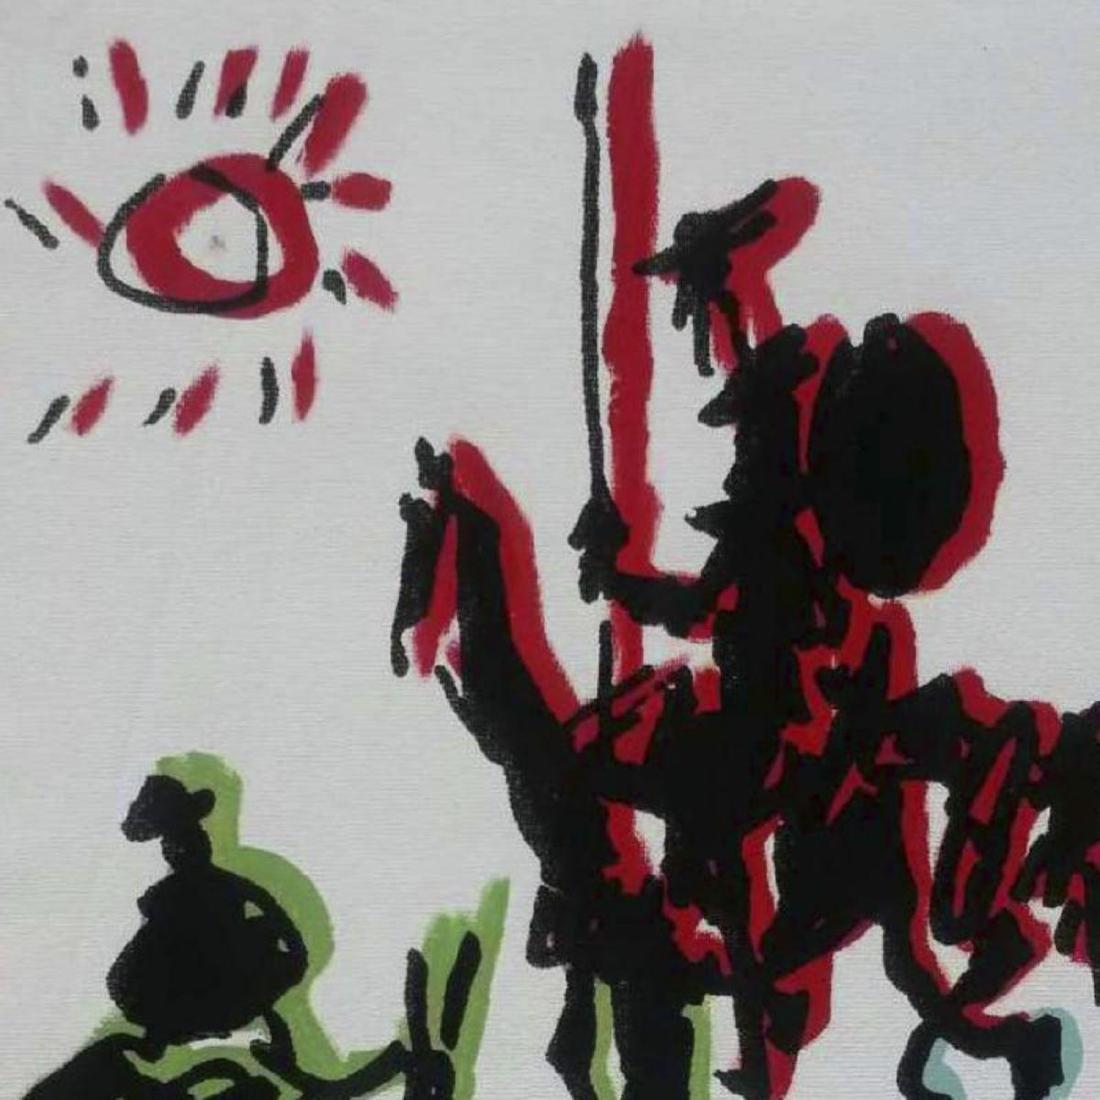 Ringo Daniel Funes - (Protege of Andy Warhol's - 2